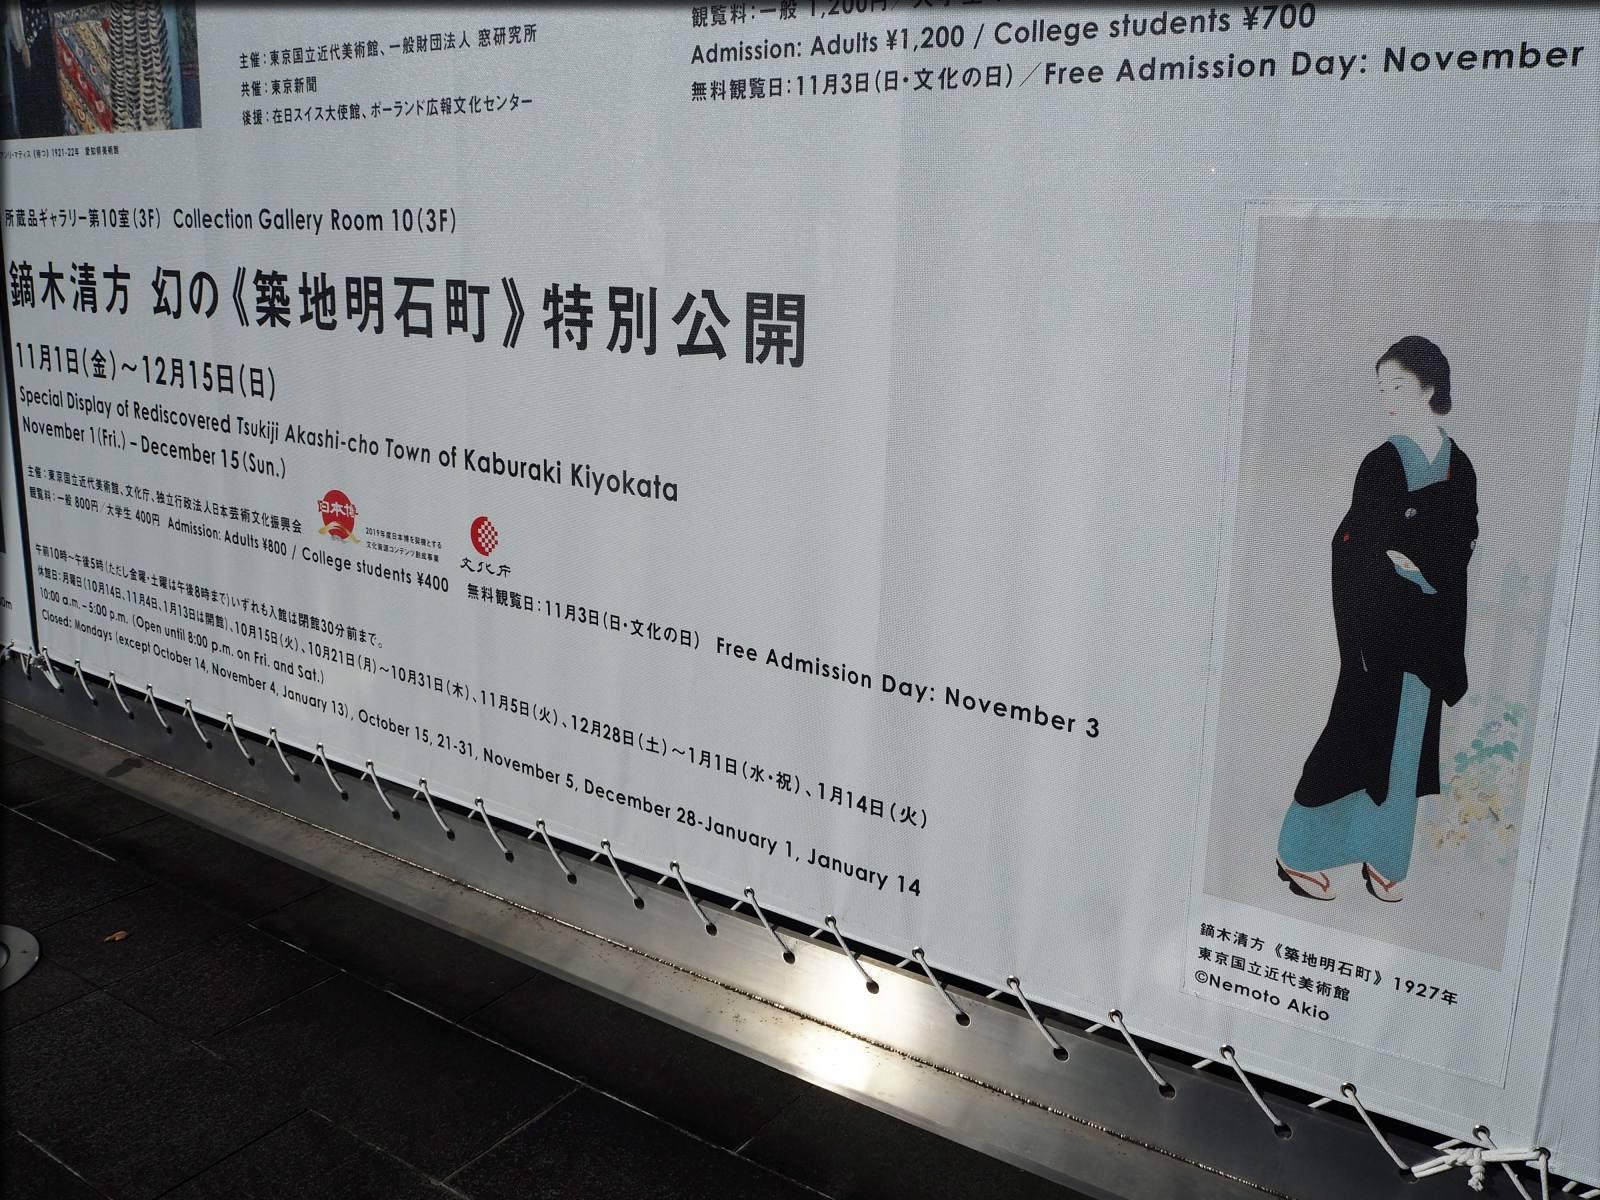 東京国立近代美術館で鏑木清方を観賞_b0054329_08213043.jpg